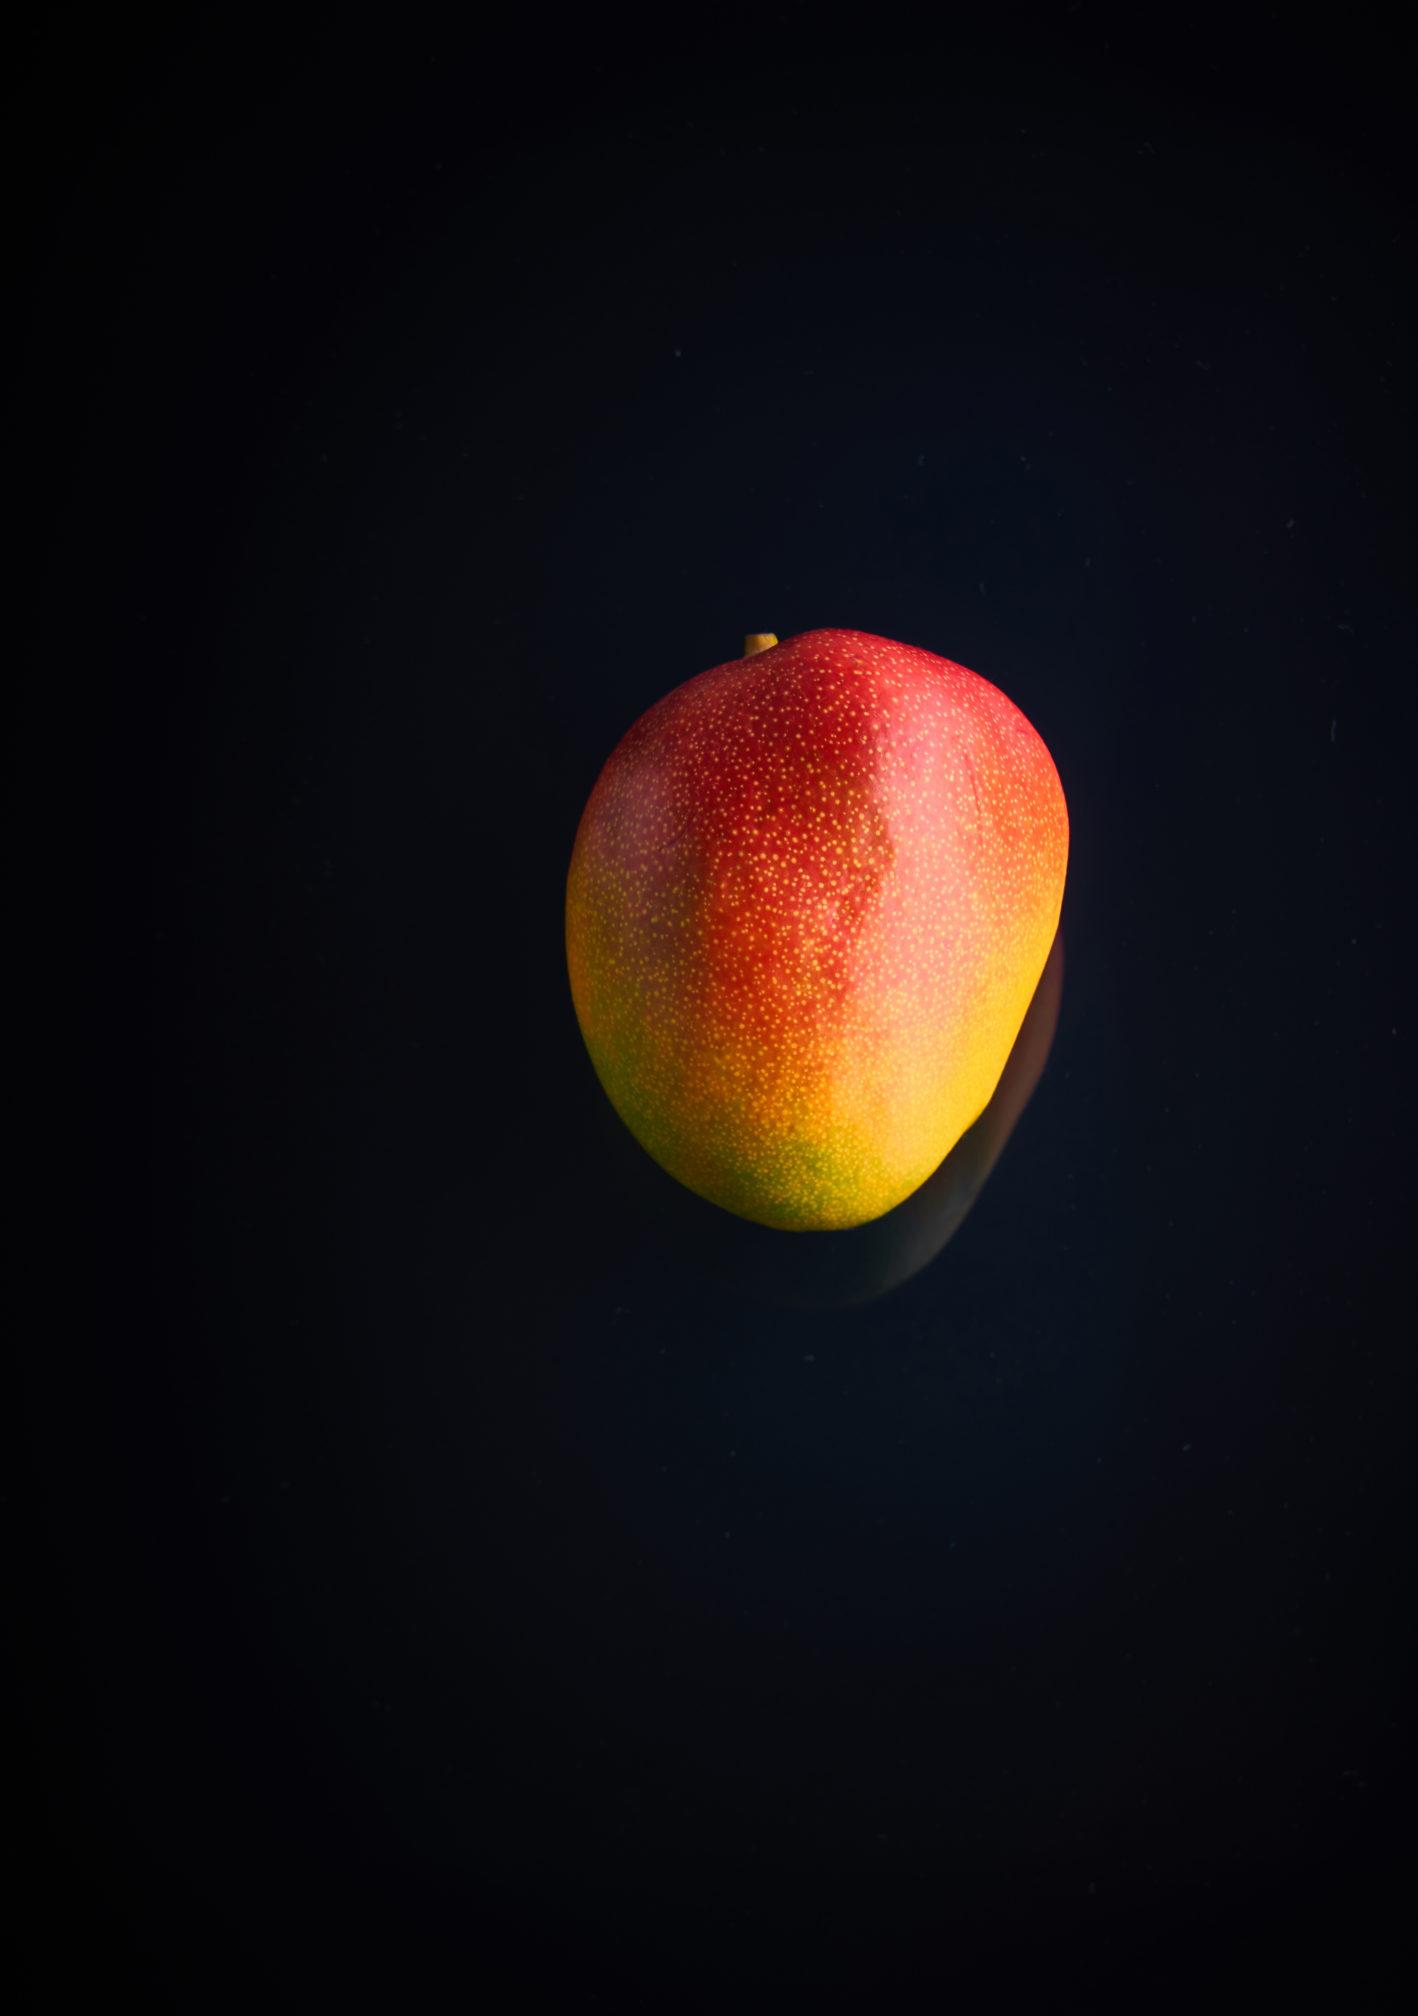 capexo-lilot-fruits-exotique-mangue-monde